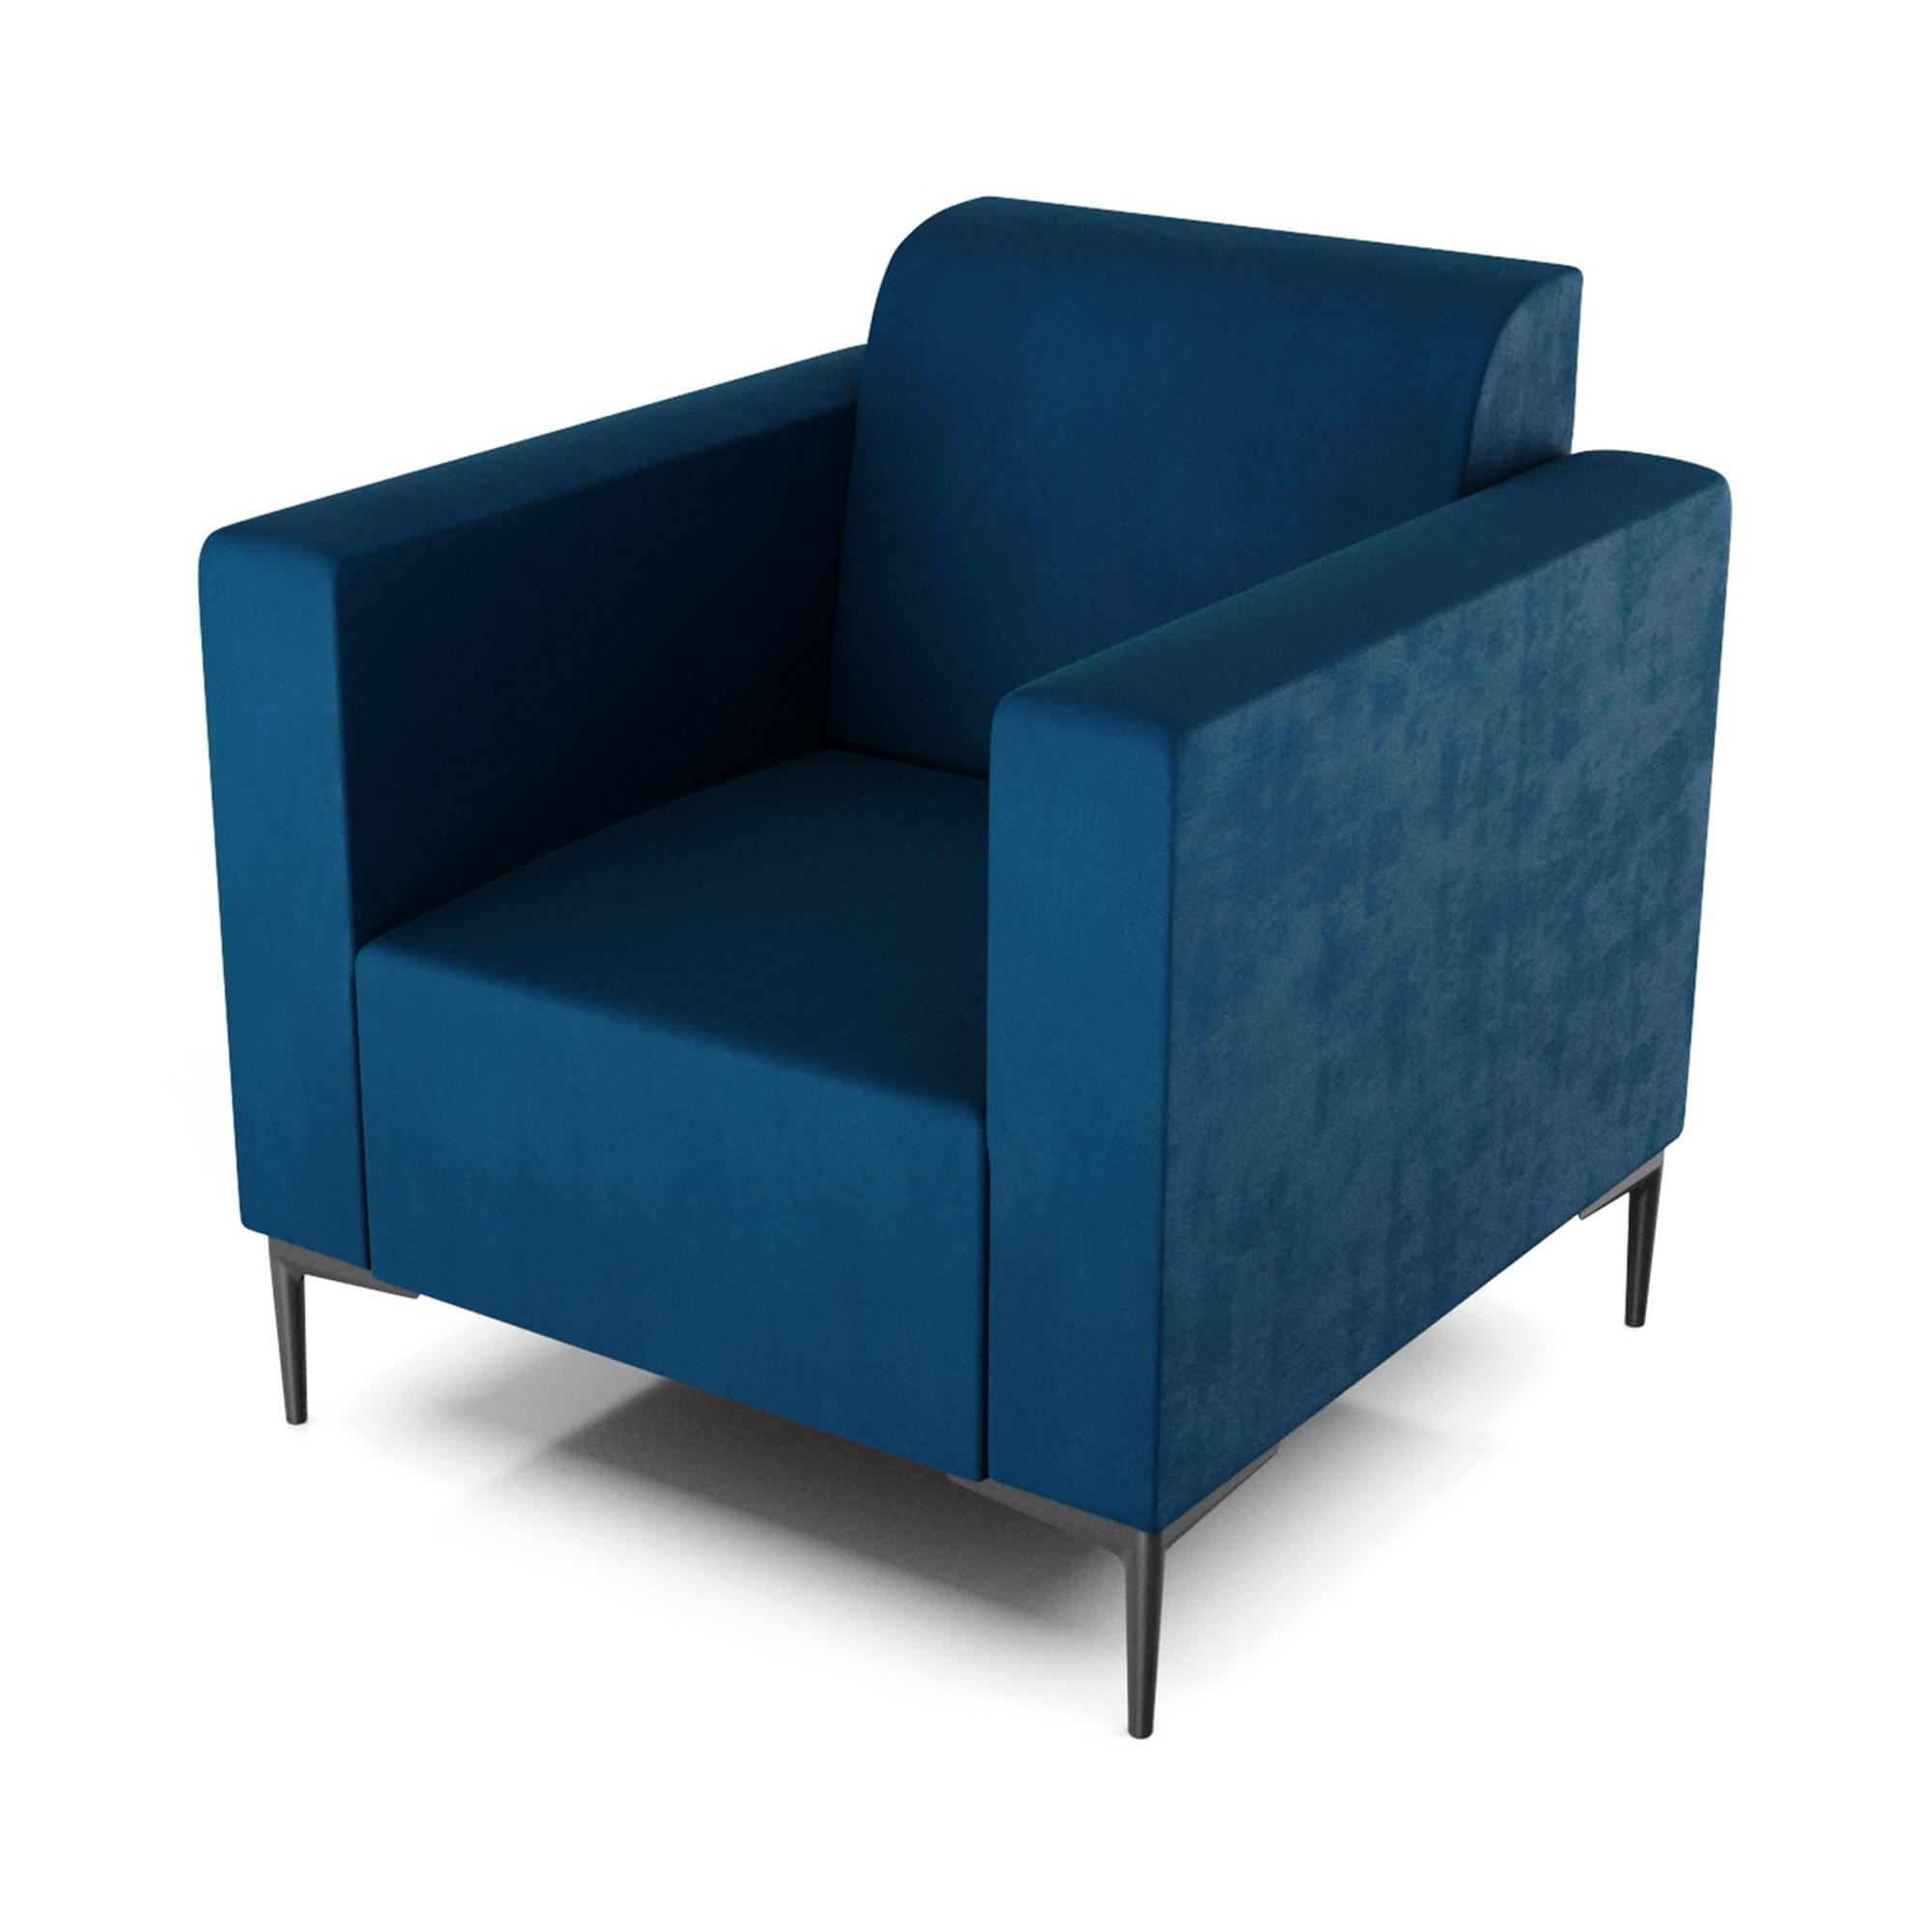 Кресло AS Тиффани 79x78x73 см синий кресло as тиффани 79x78x73 см коричневый